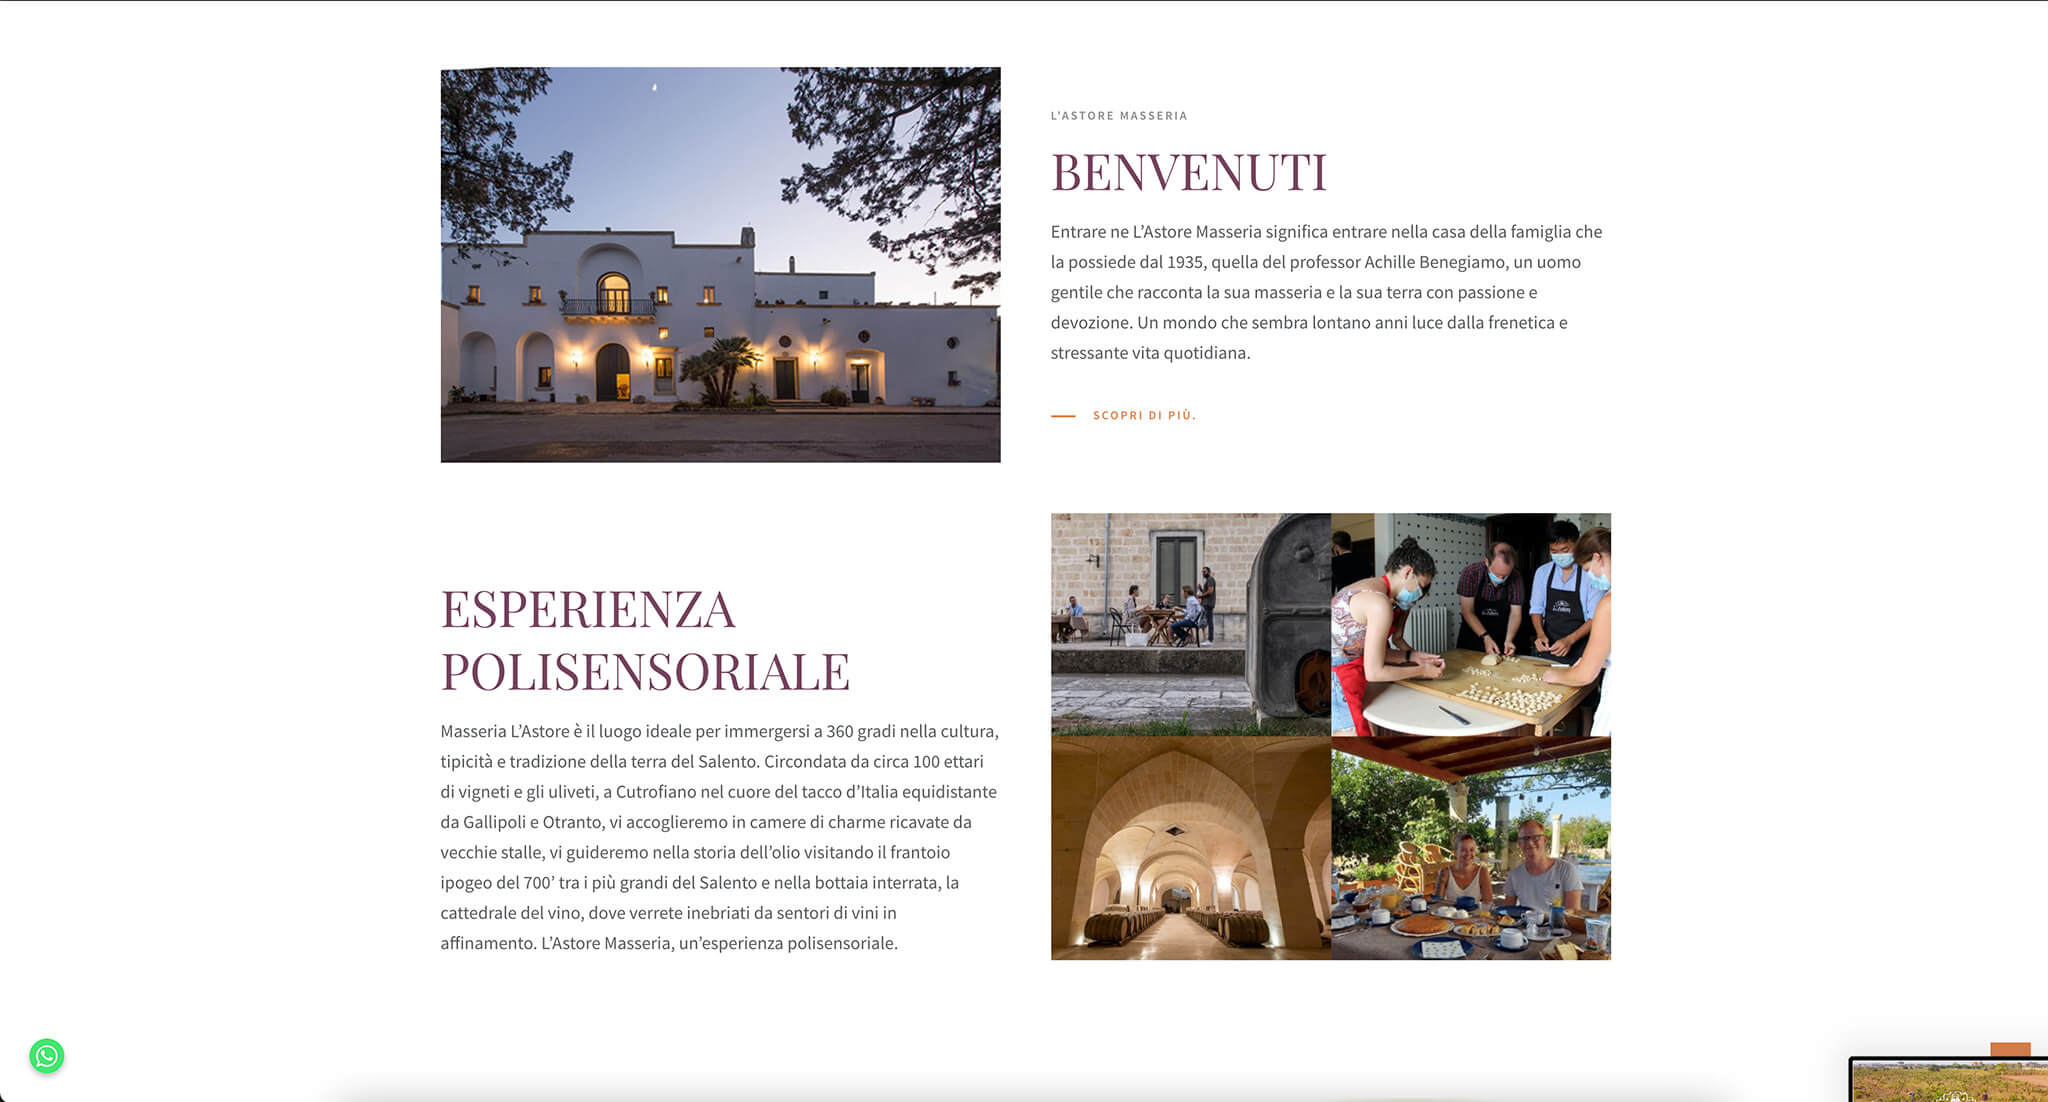 L'Astore Masseria Website Overview